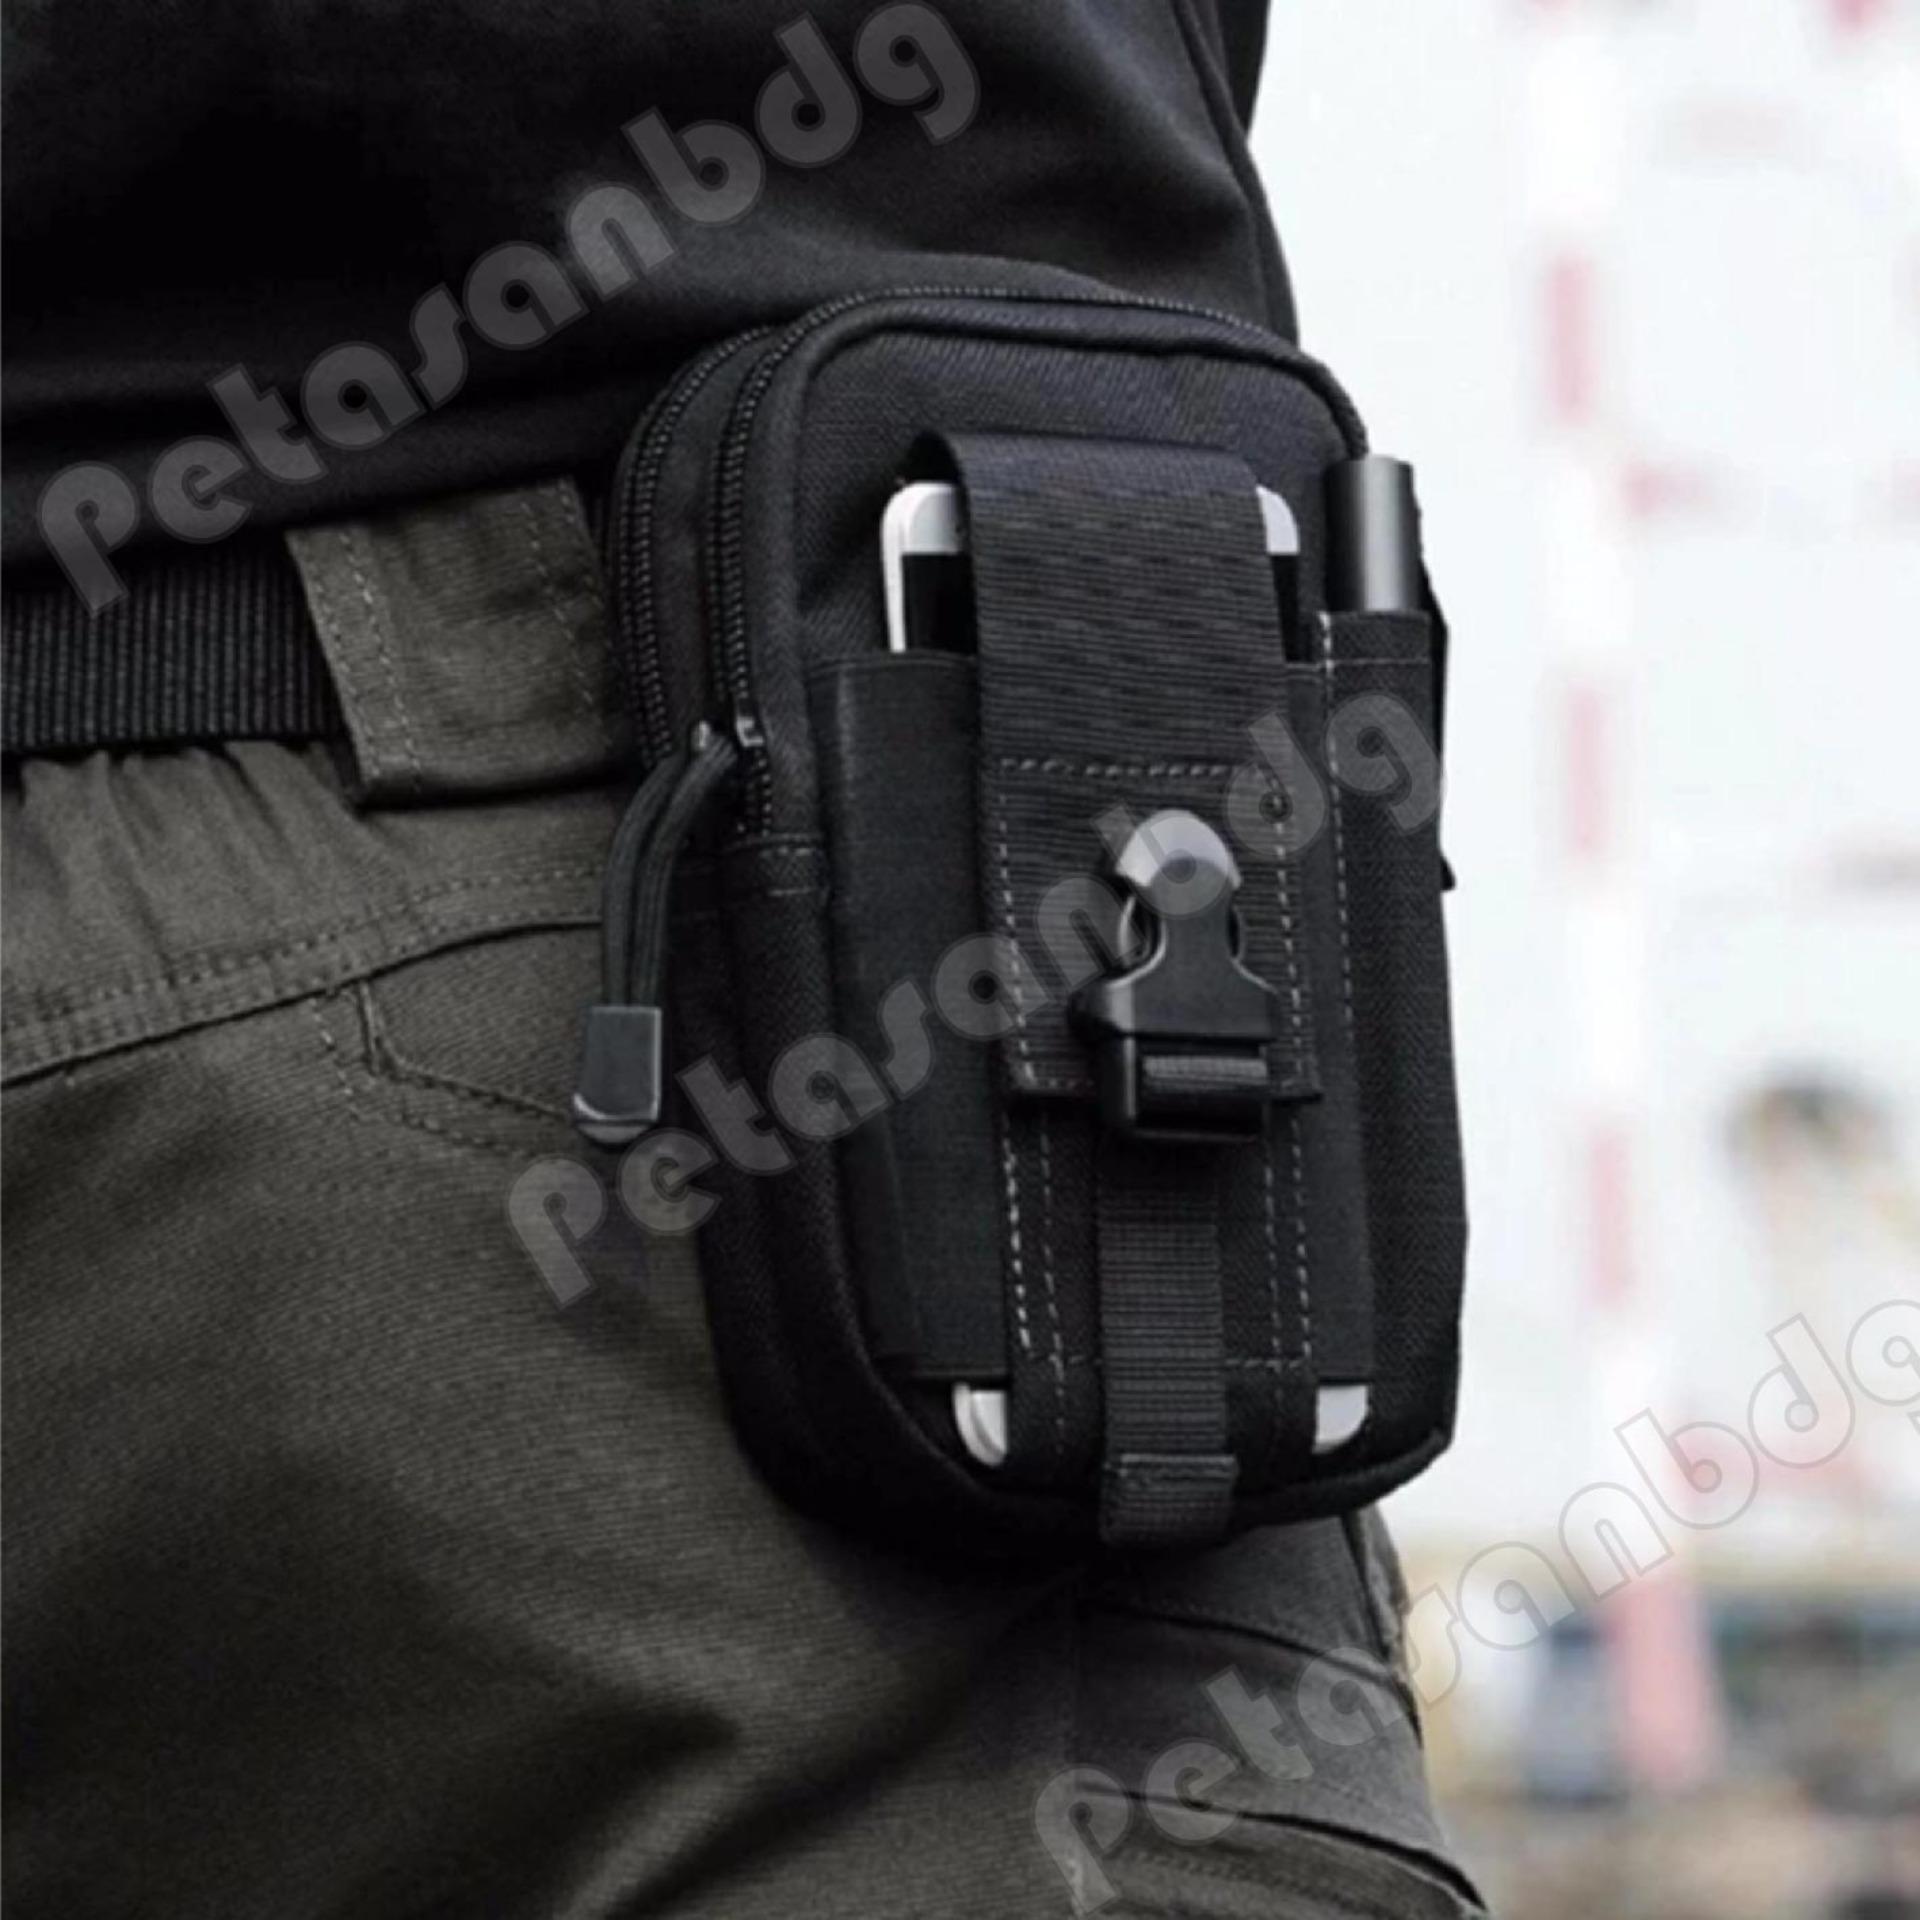 Tas Ransel Gear Bag - Cyborg X23 Tas Laptop Backpack - Black Grey + Raincover +